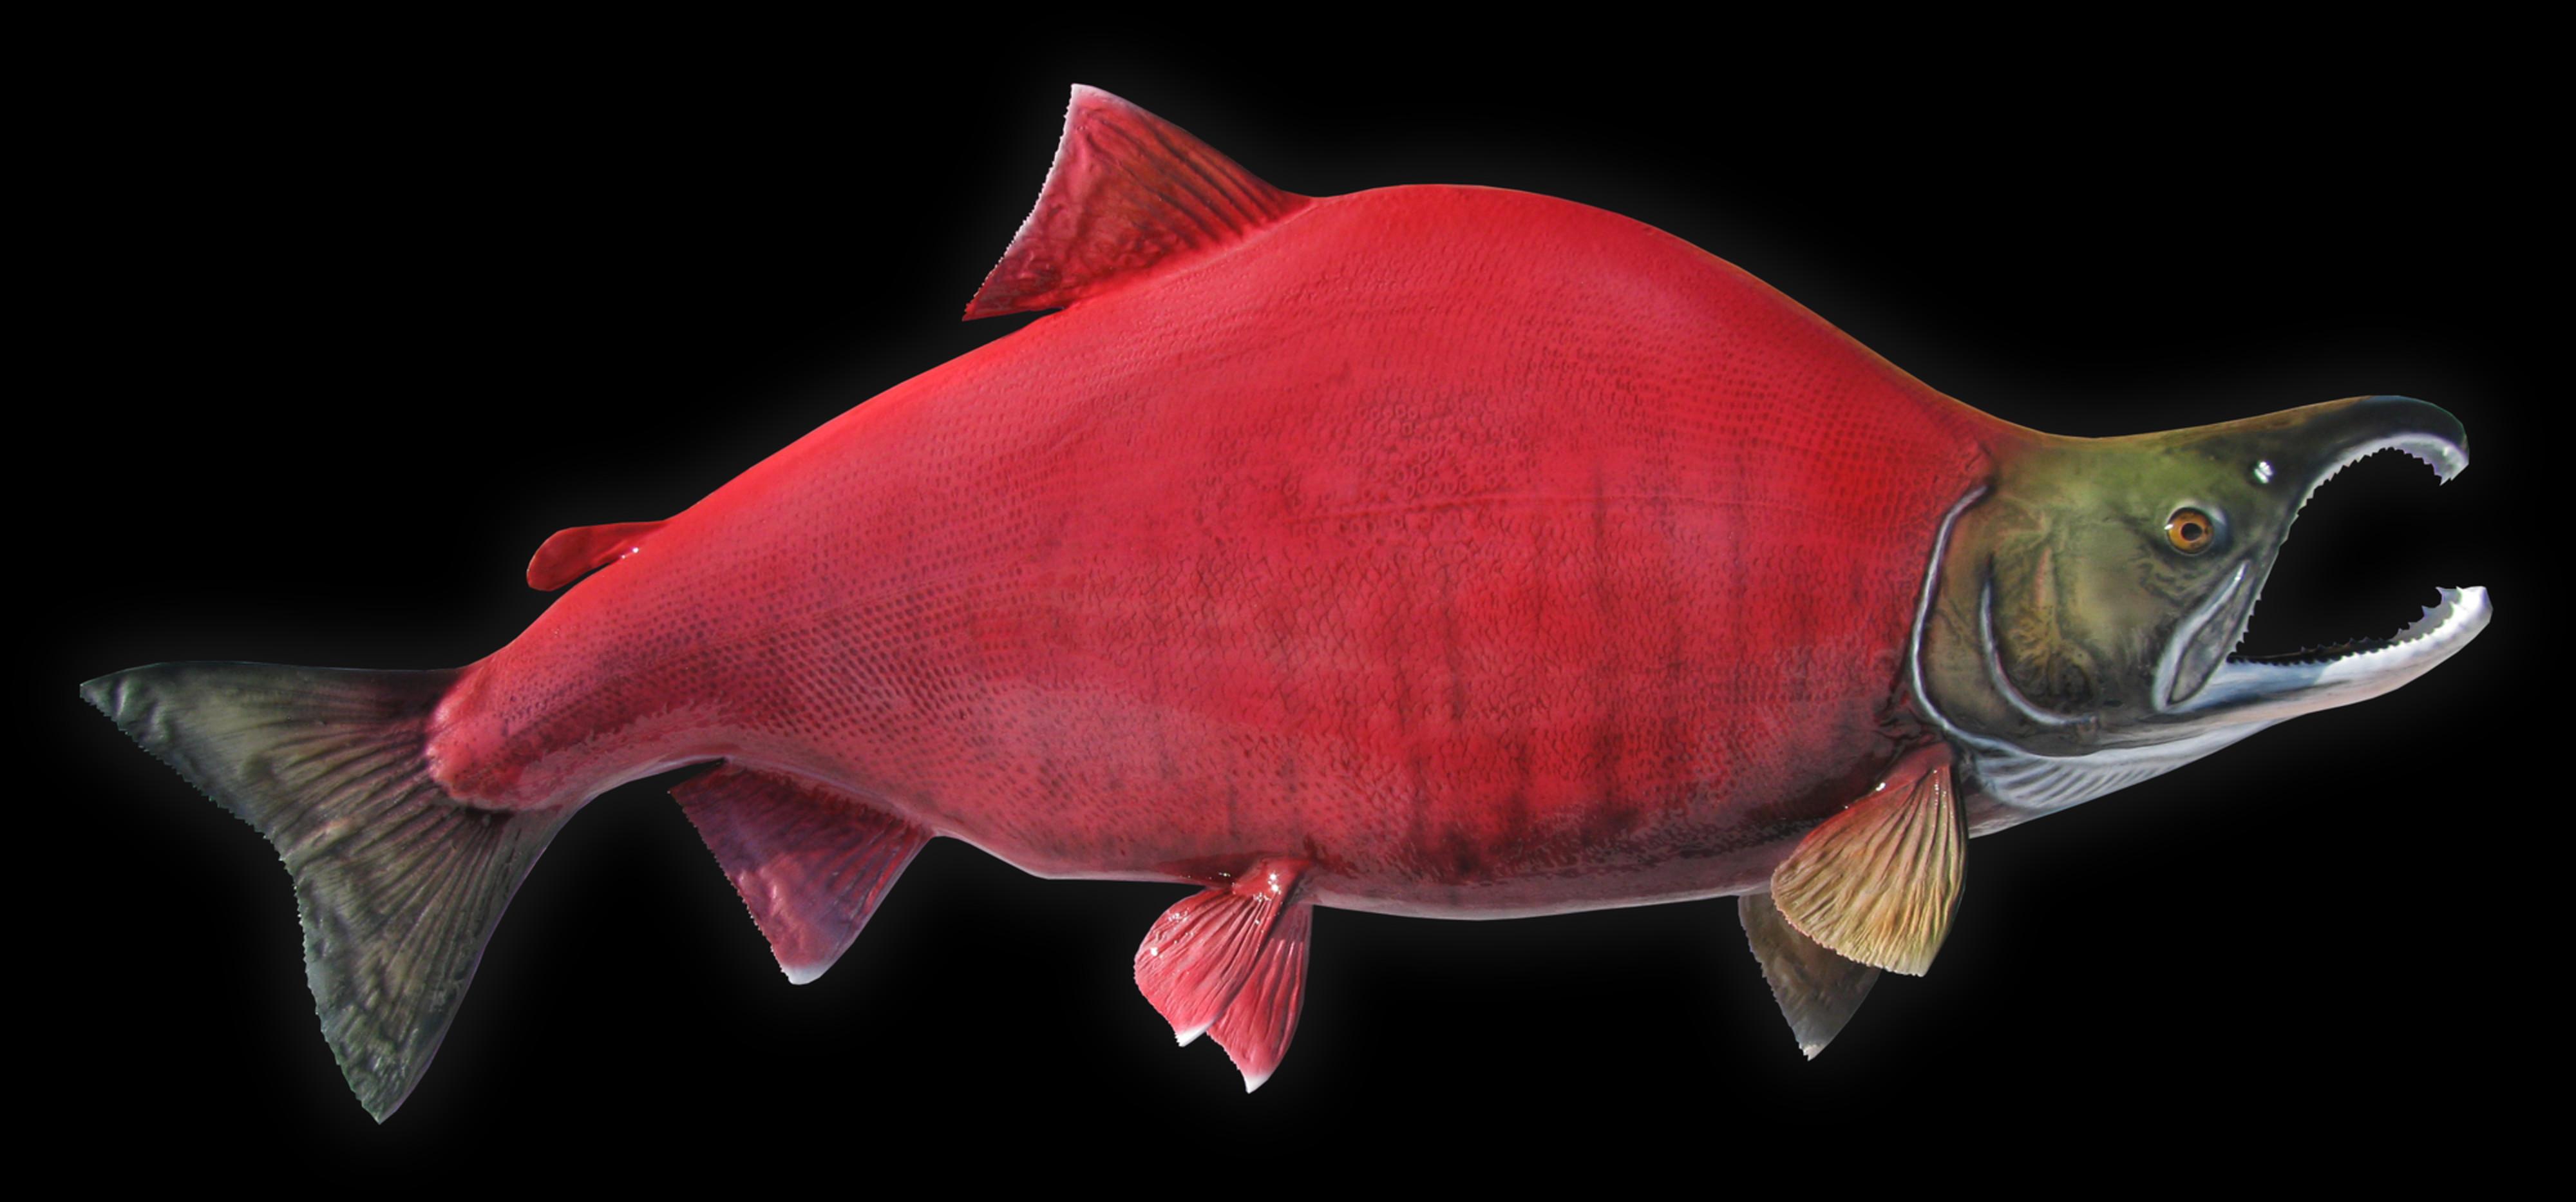 Red salmon fish - photo#17